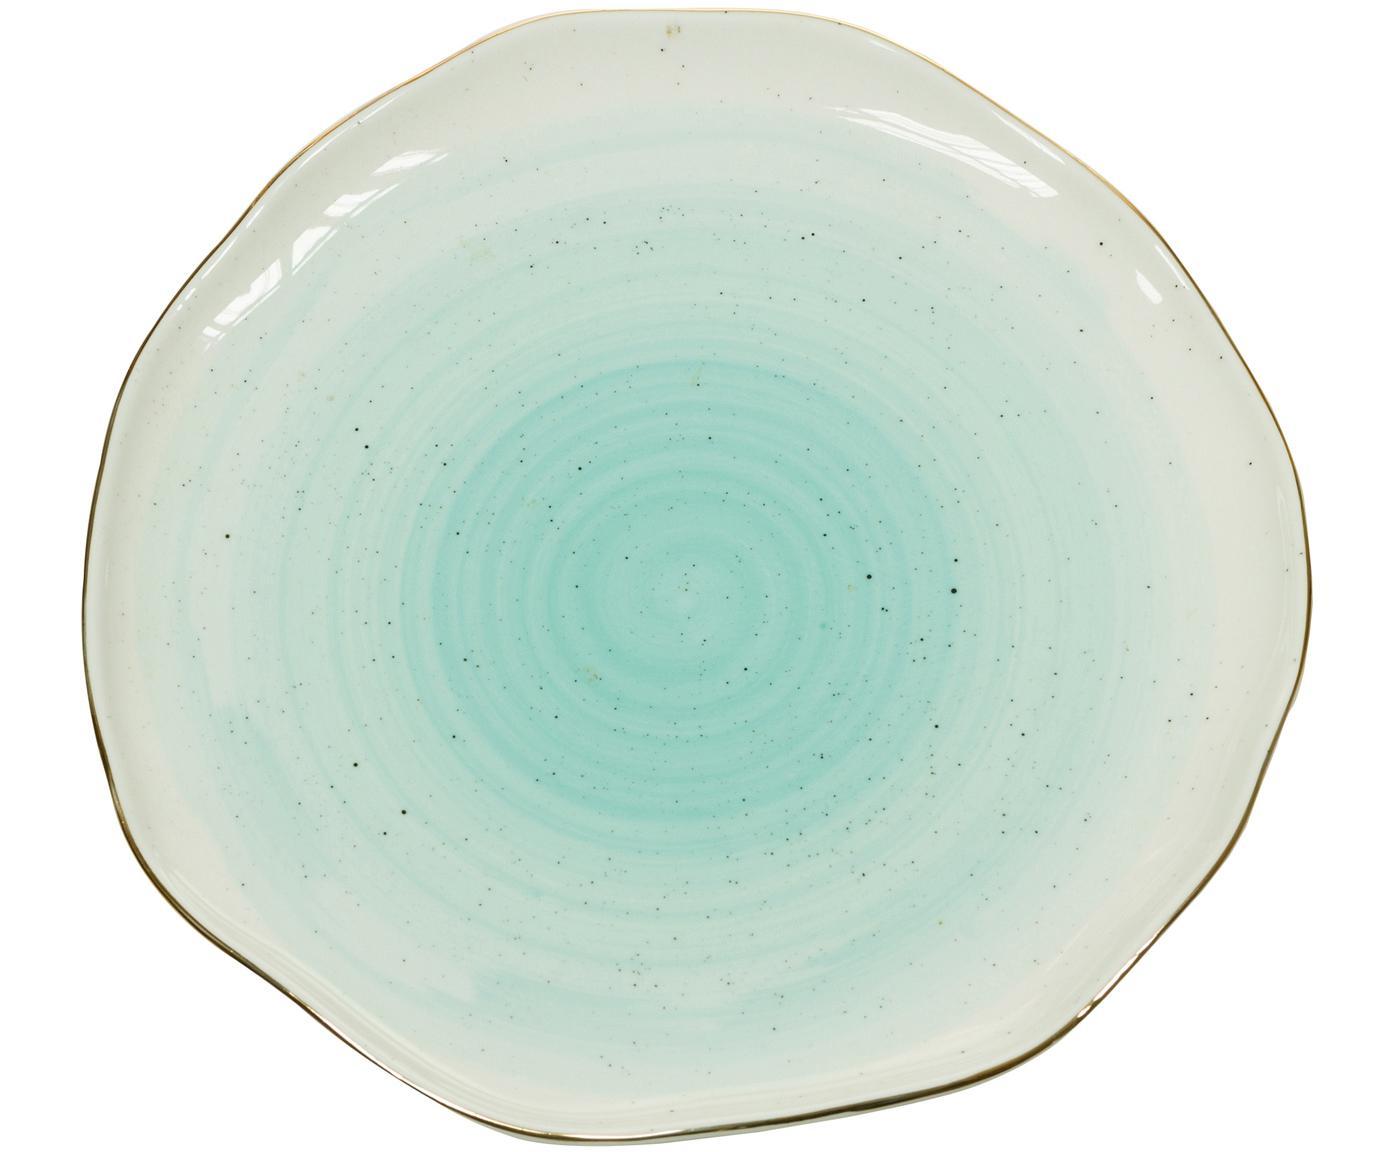 Handgefertigte Speiseteller Bol mit Goldrand, 2 Stück, Porzellan, Türkisblau, Ø 26 x H 3 cm